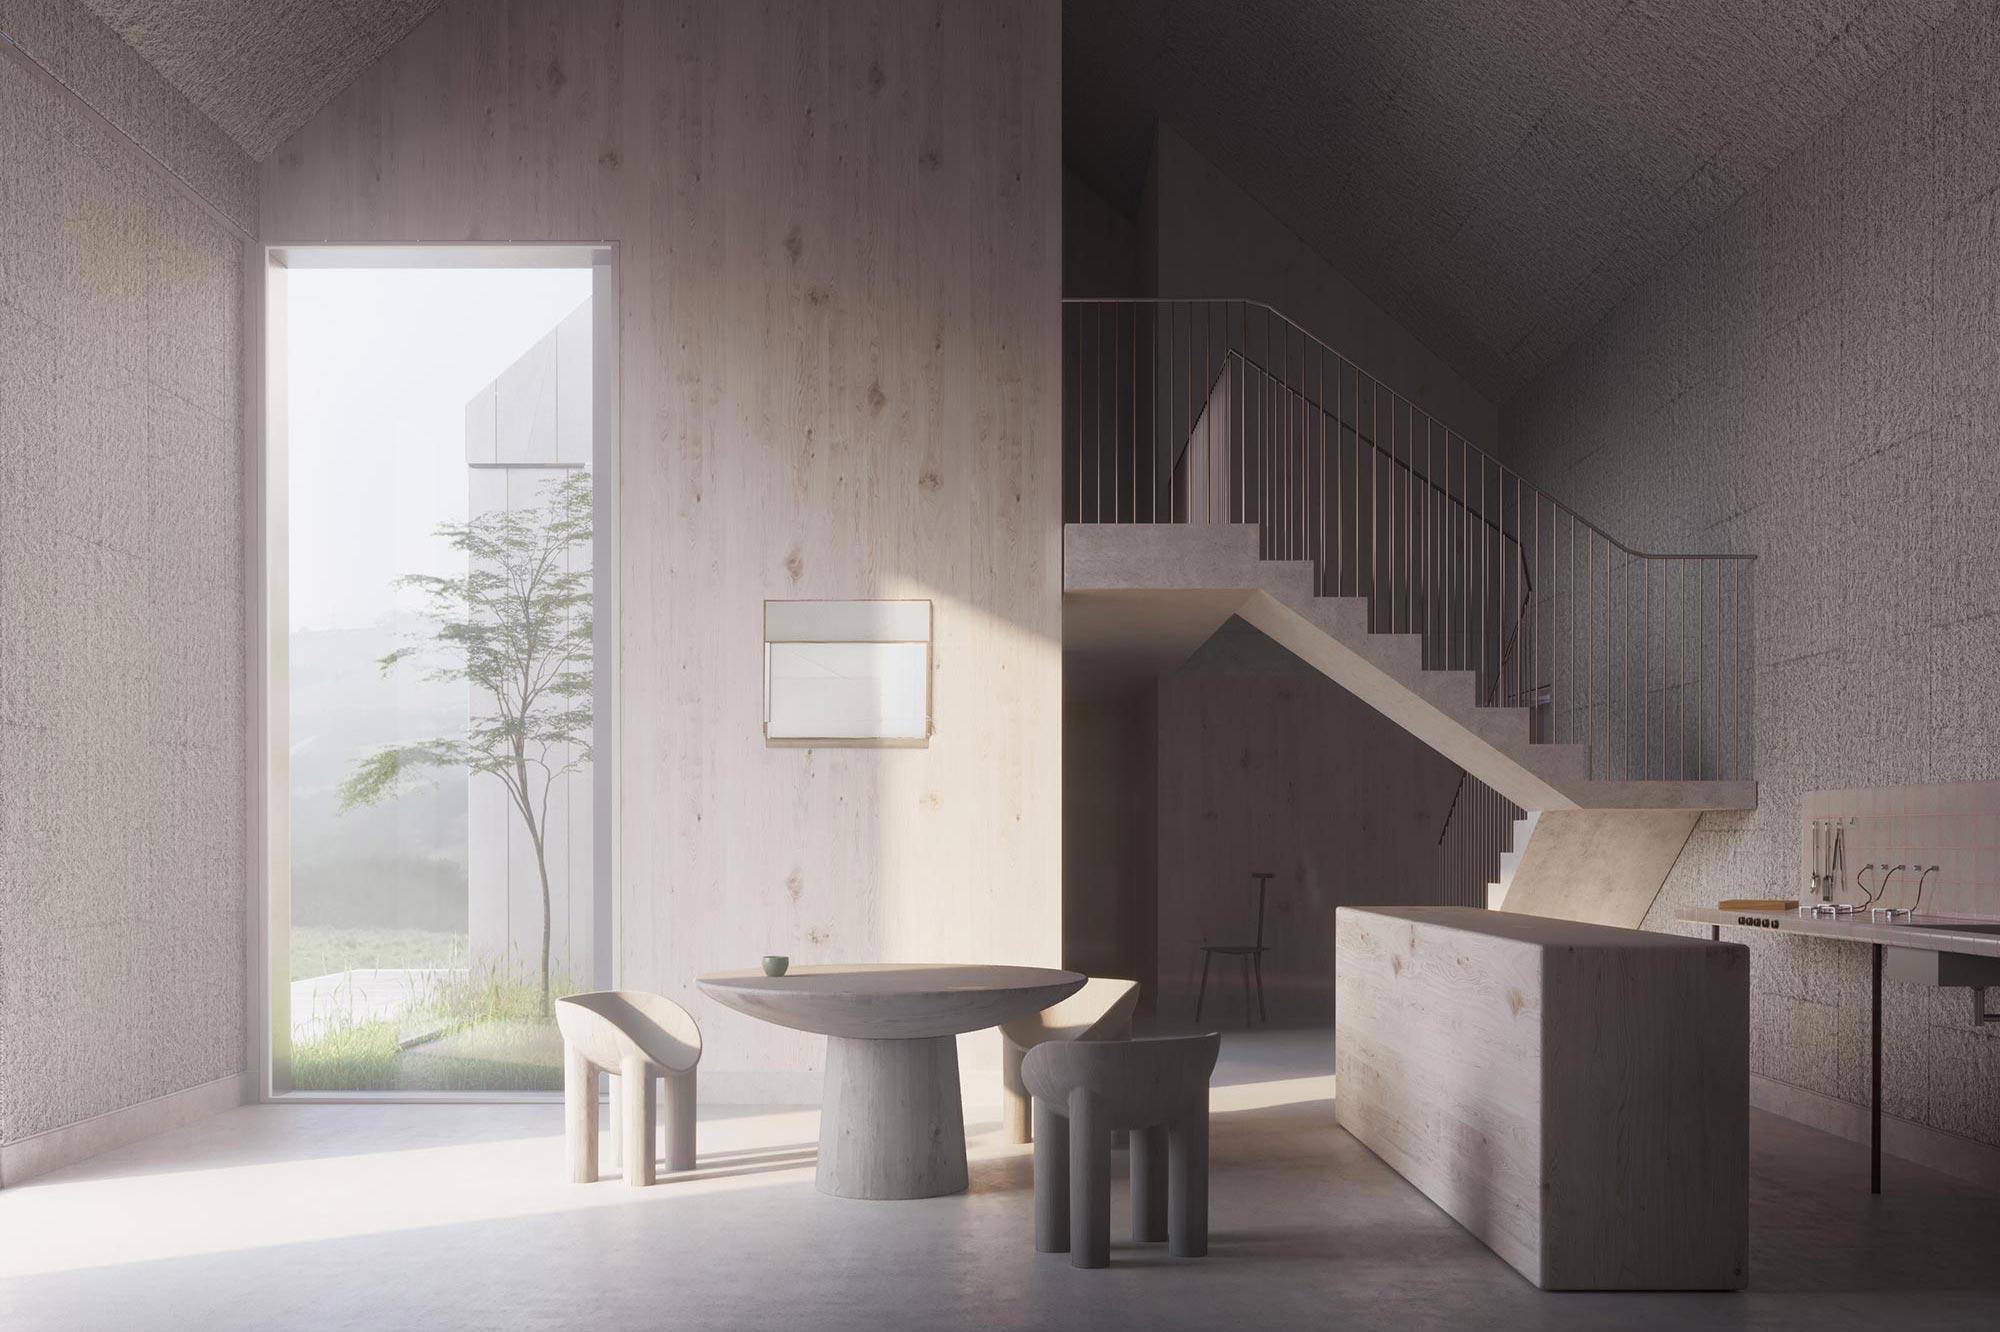 cube-haus-faye-toogood-architects-cs-2000px-04